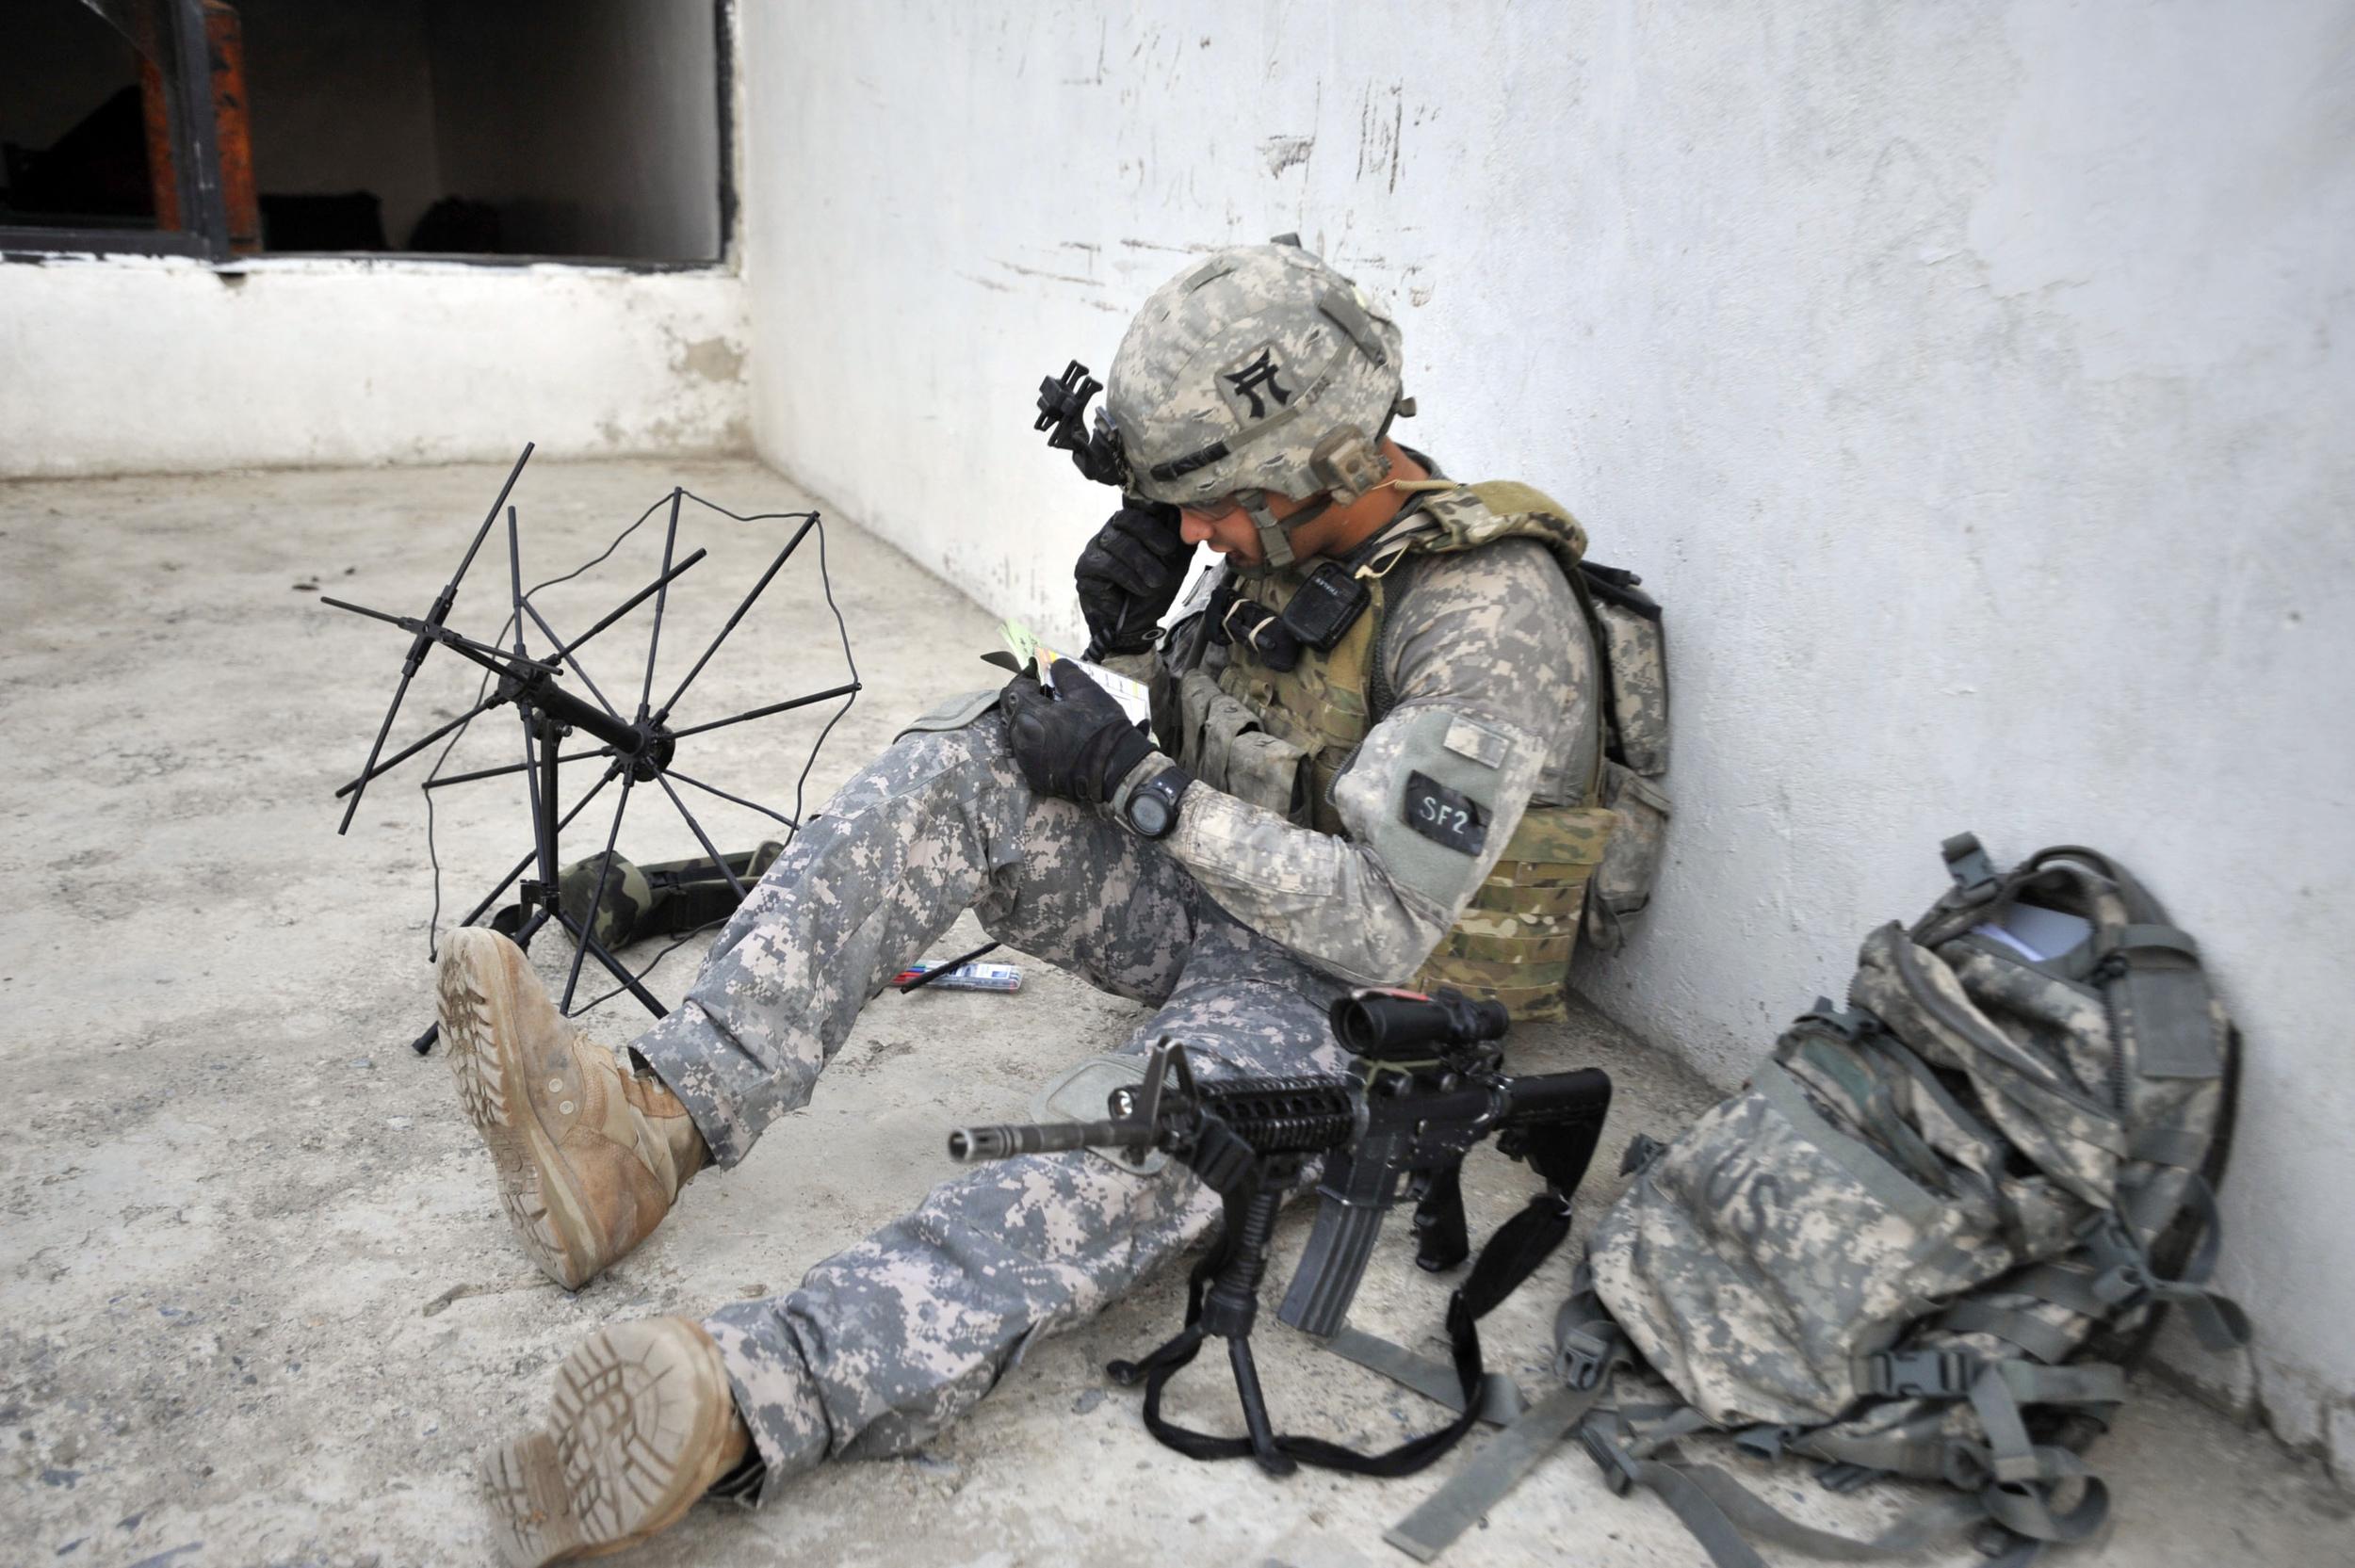 DoD photo by Pfc. Chris McKenna, U.S. Army